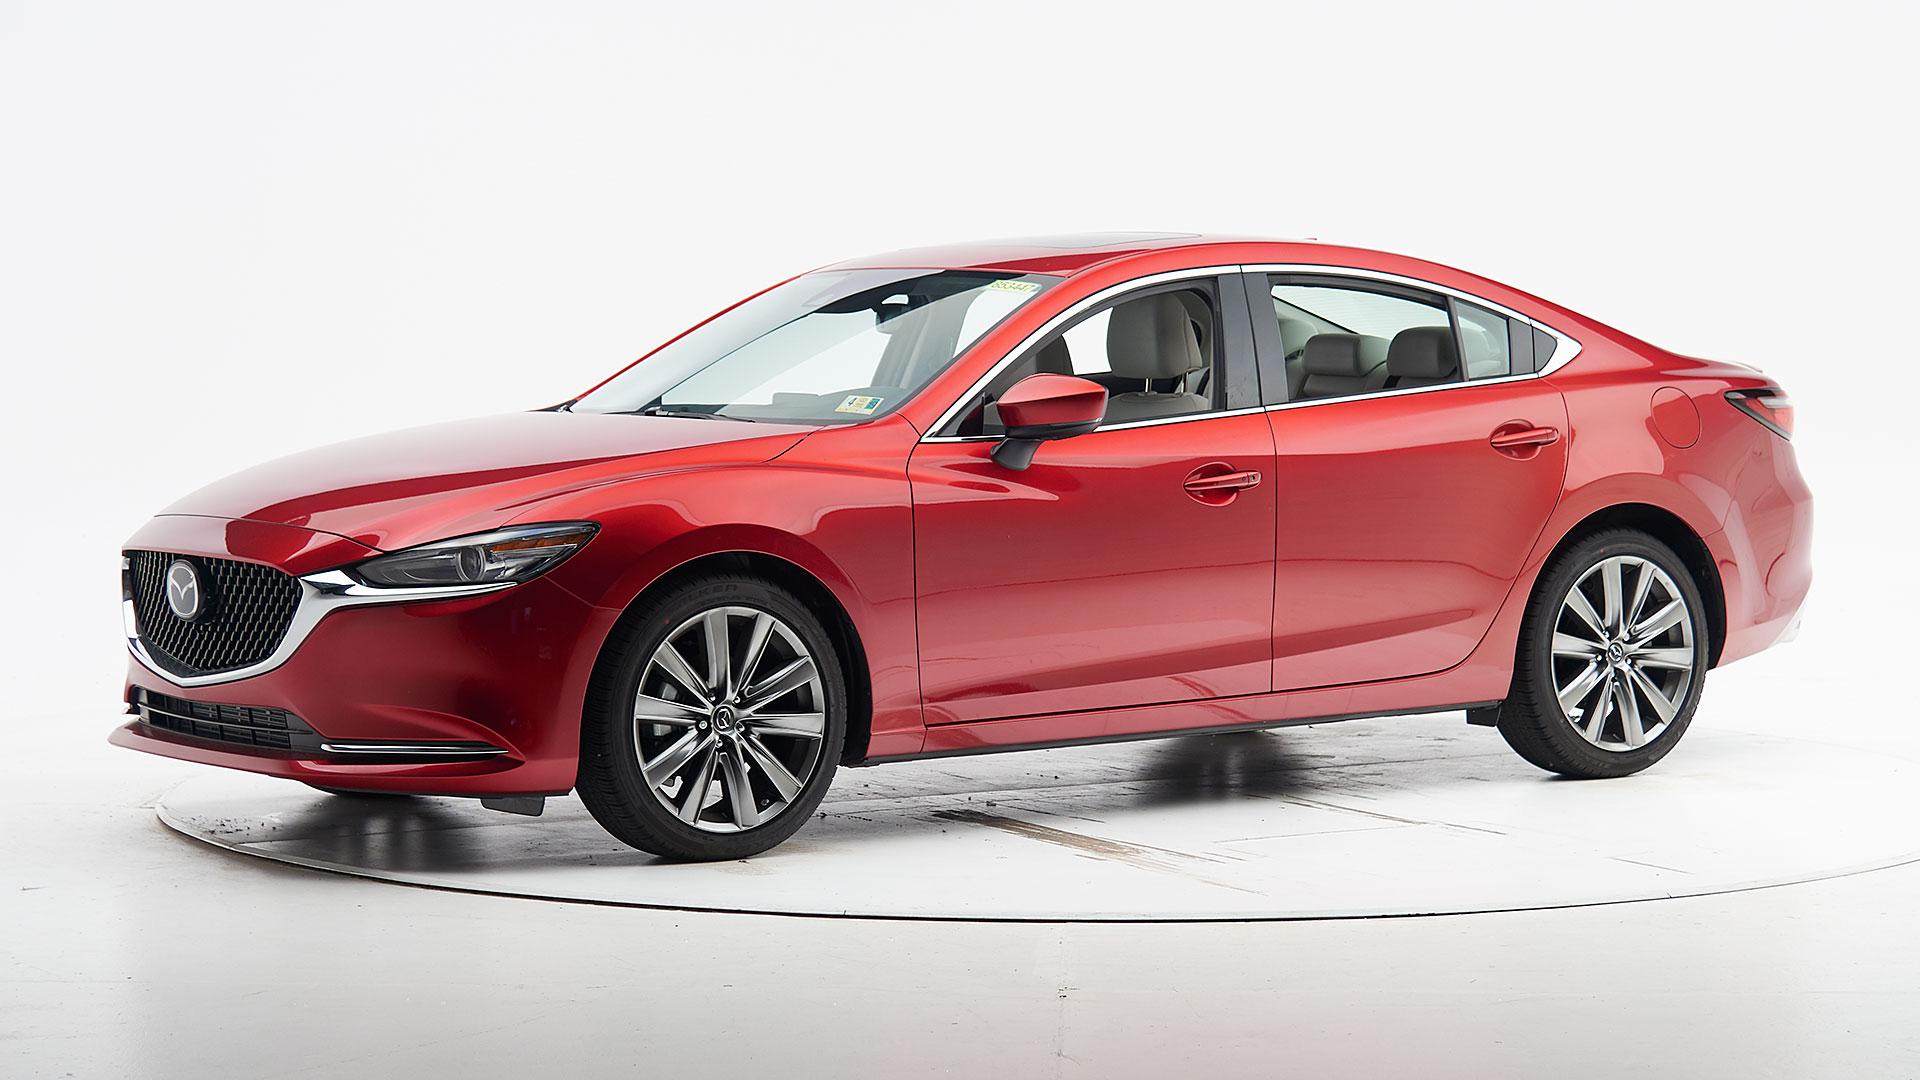 Kelebihan Mazda 2018 Spesifikasi